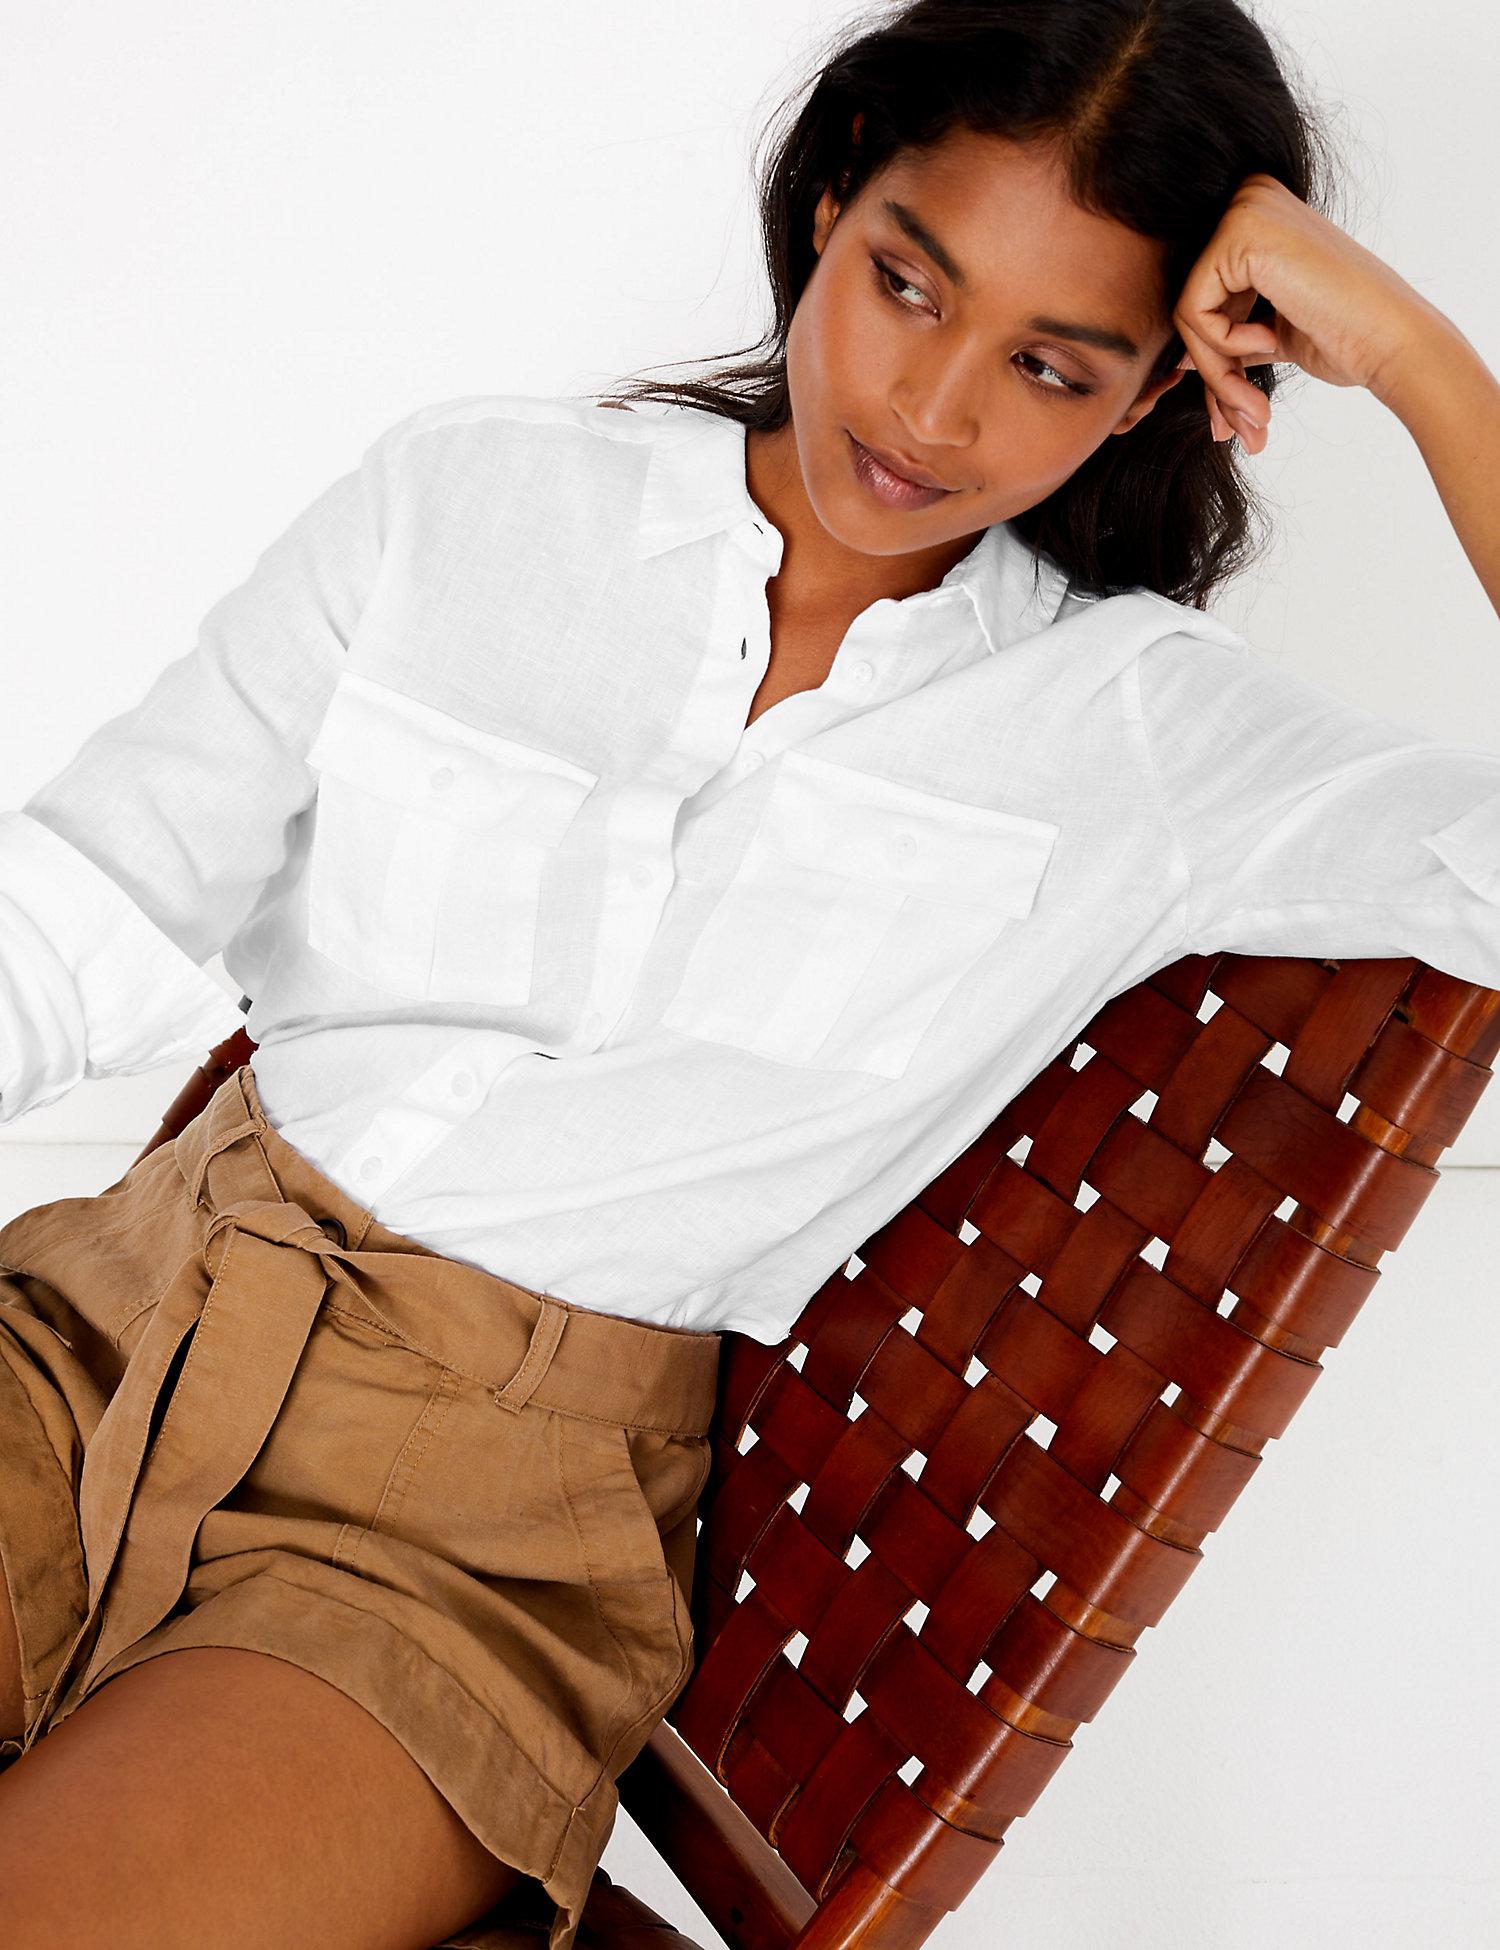 M&S Linen Pure Linen Utility Shirt £29.50